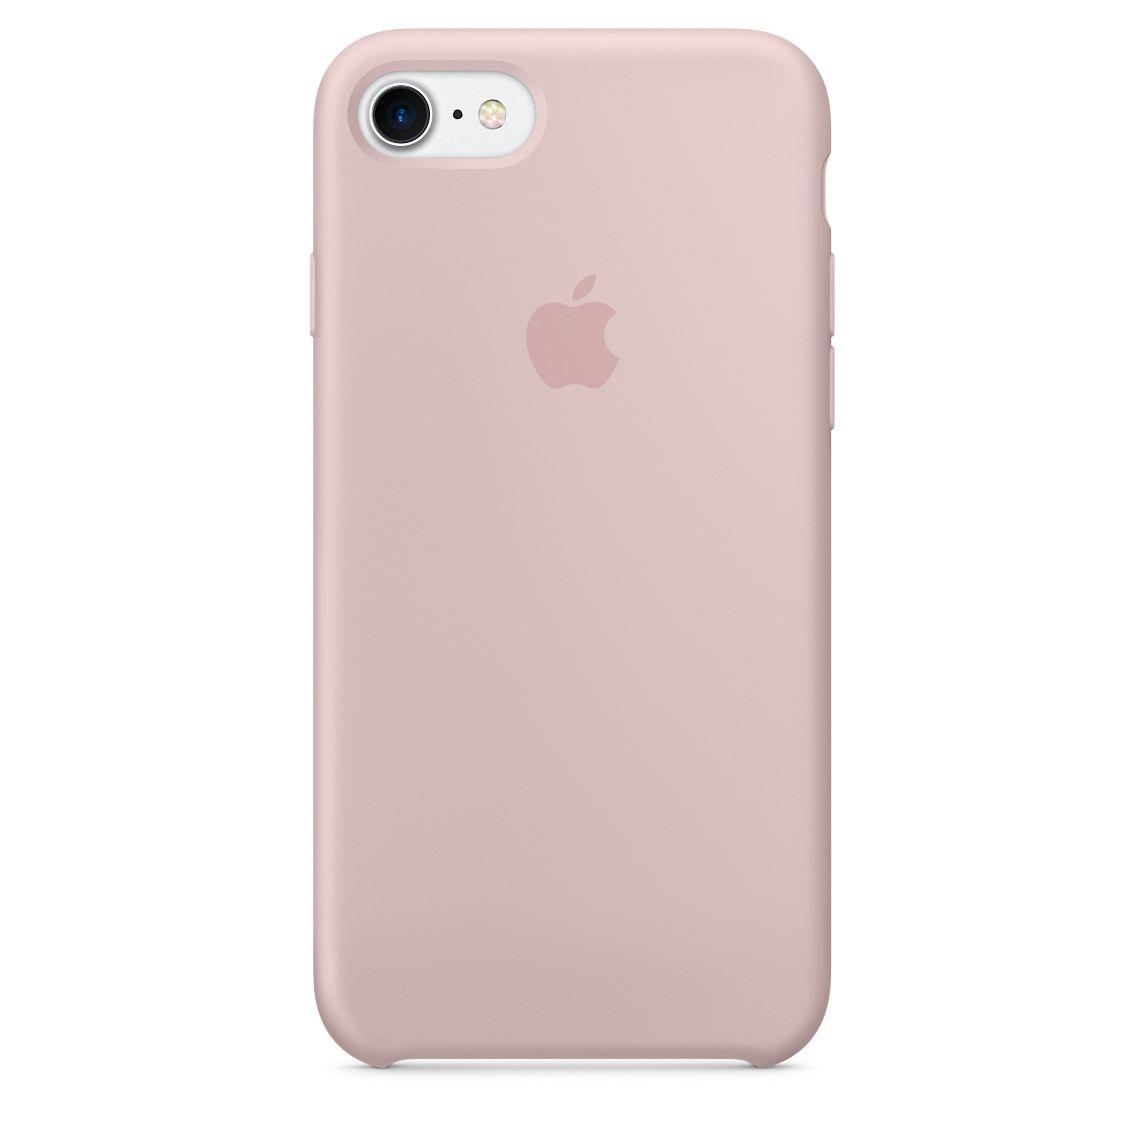 Iphone 7 Silikon Case Stein Apple De Iphone Handyhulle Iphone Handyhullen Iphone 6